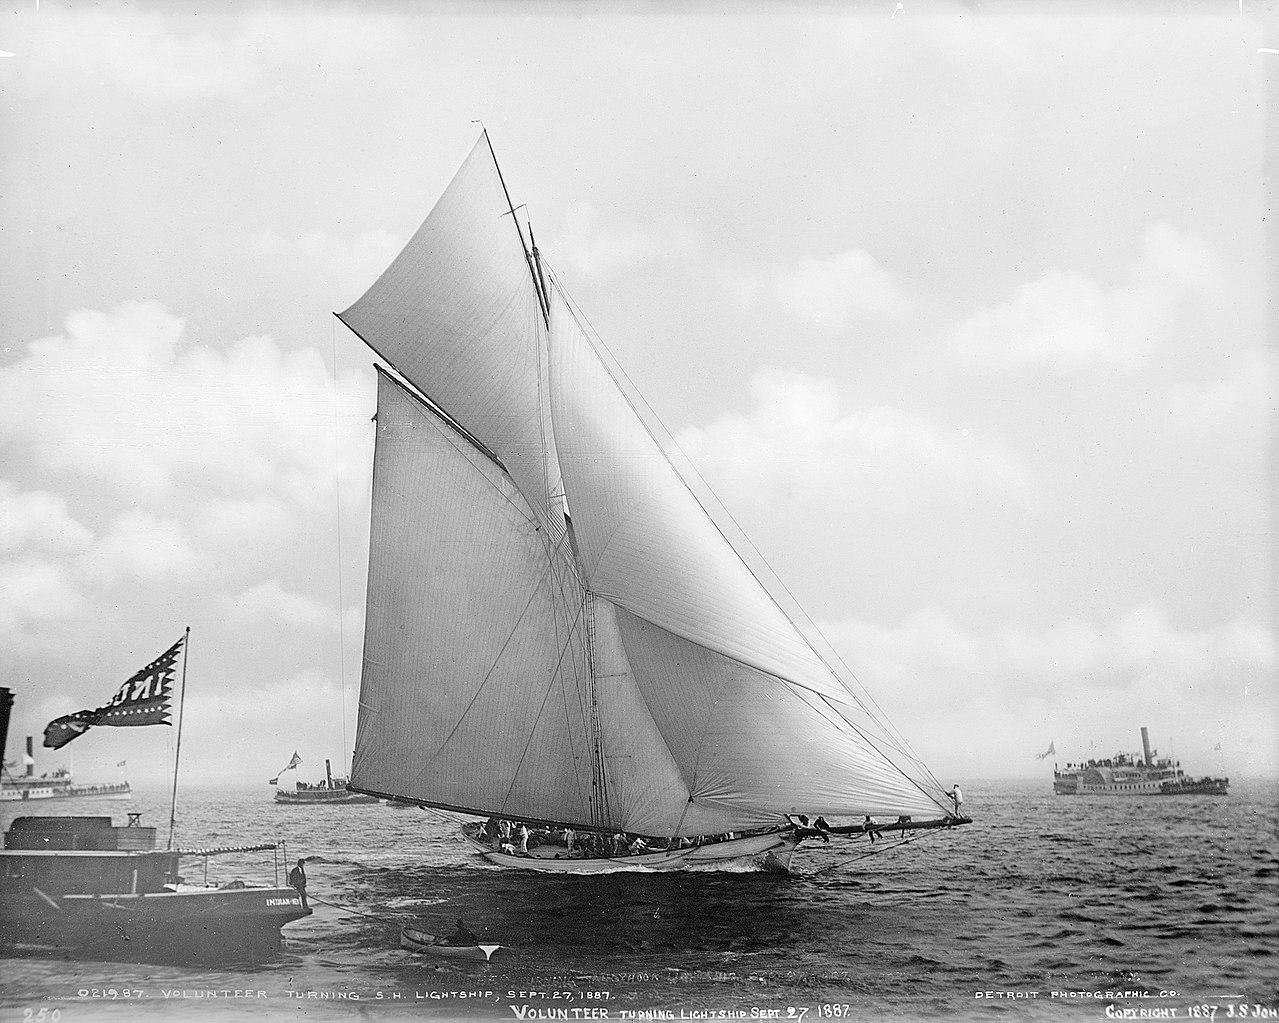 Canvas sail on a sailboat